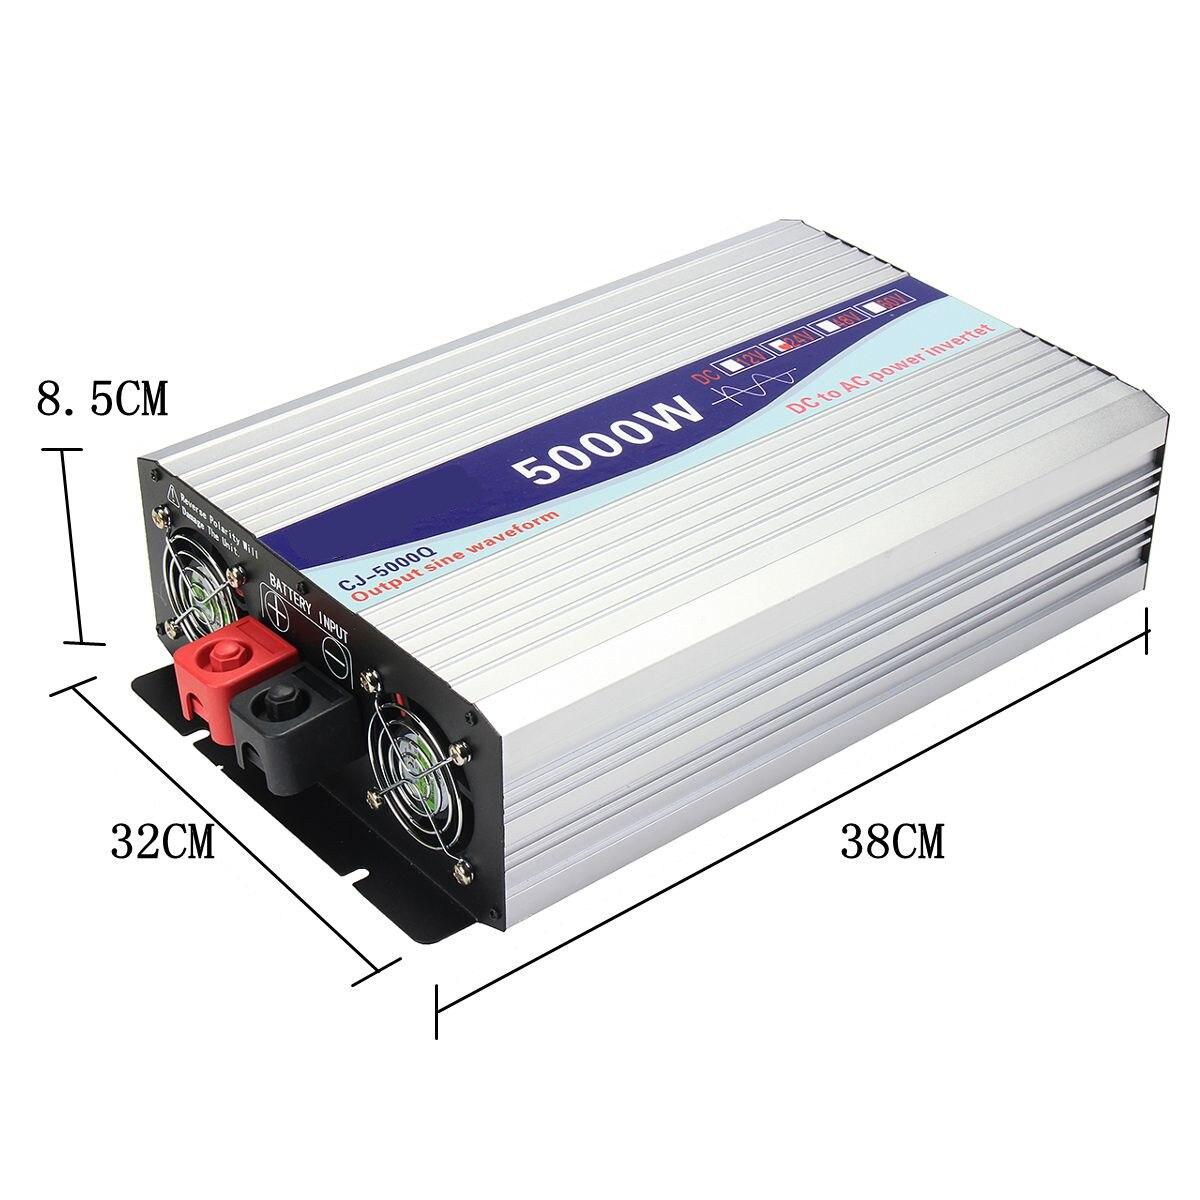 Écran Intelligent pur onduleur à onde sinusoïdale 12 V/24 V à 220 V 3000 W/4000 W/5000 W/6000 W convertisseur écran LCD - 5